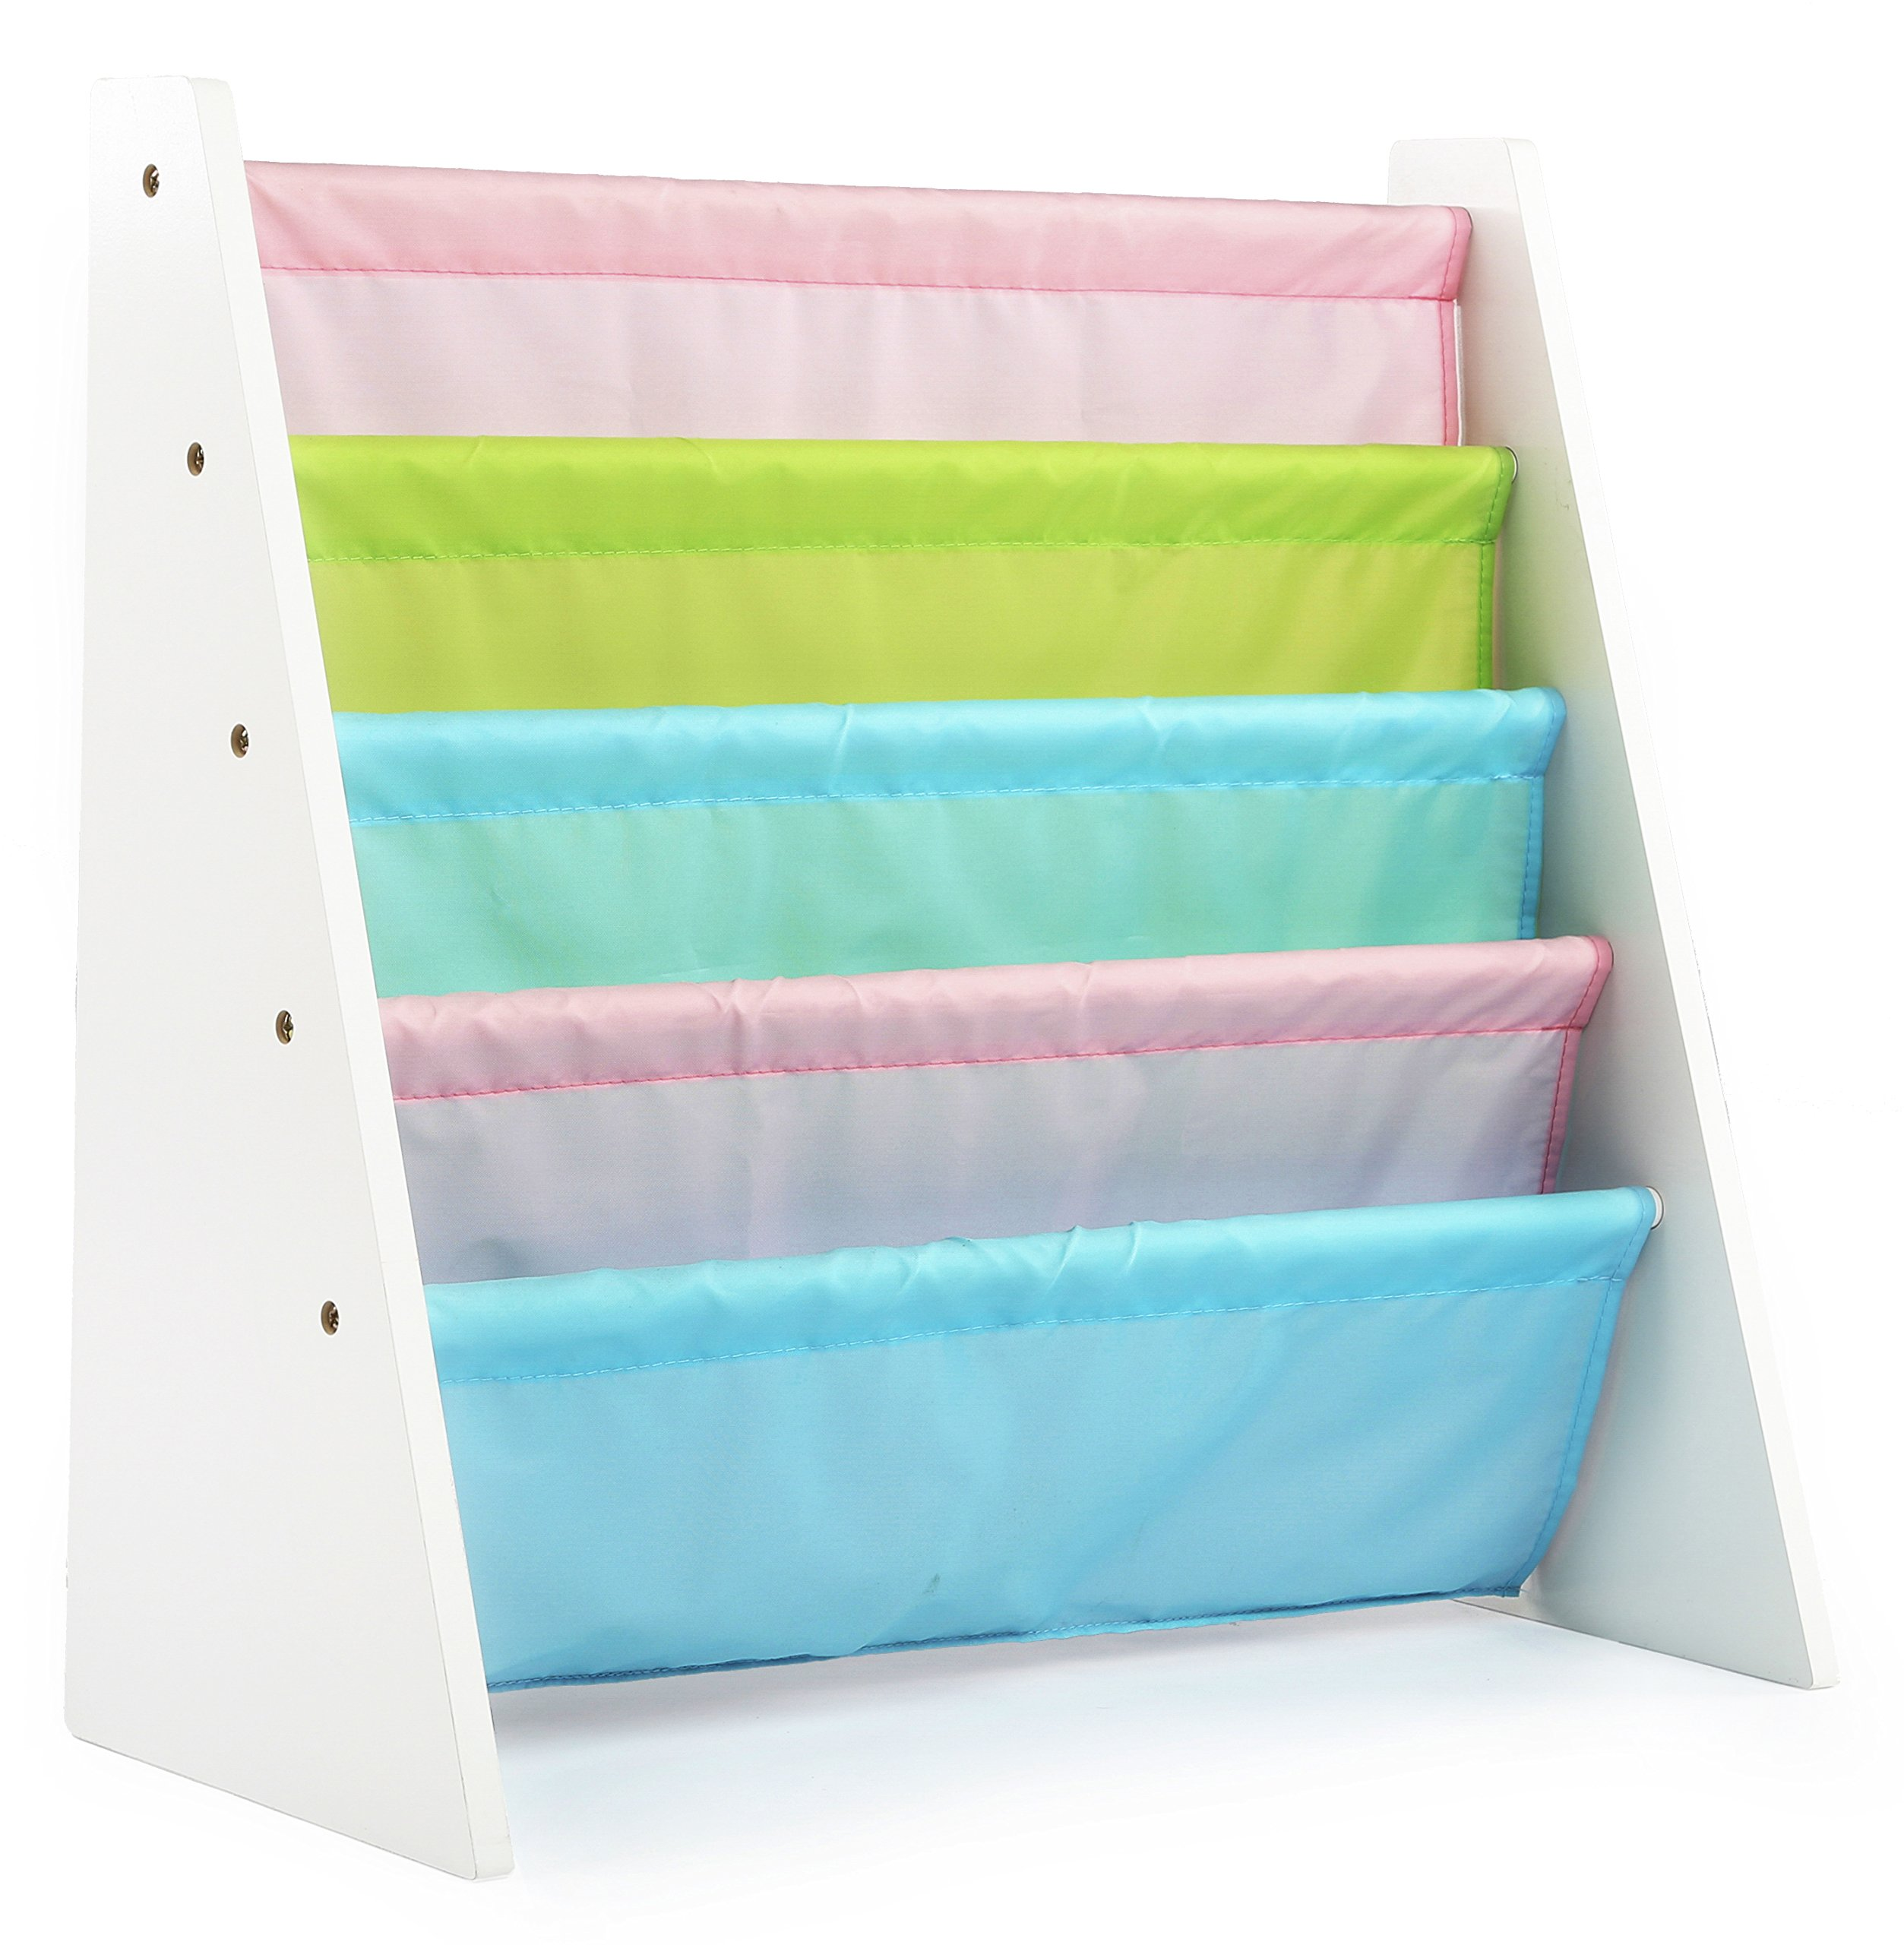 Tot Tutors Kids Book Rack Storage Bookshelf, White/Pastel (Pastel Collection)